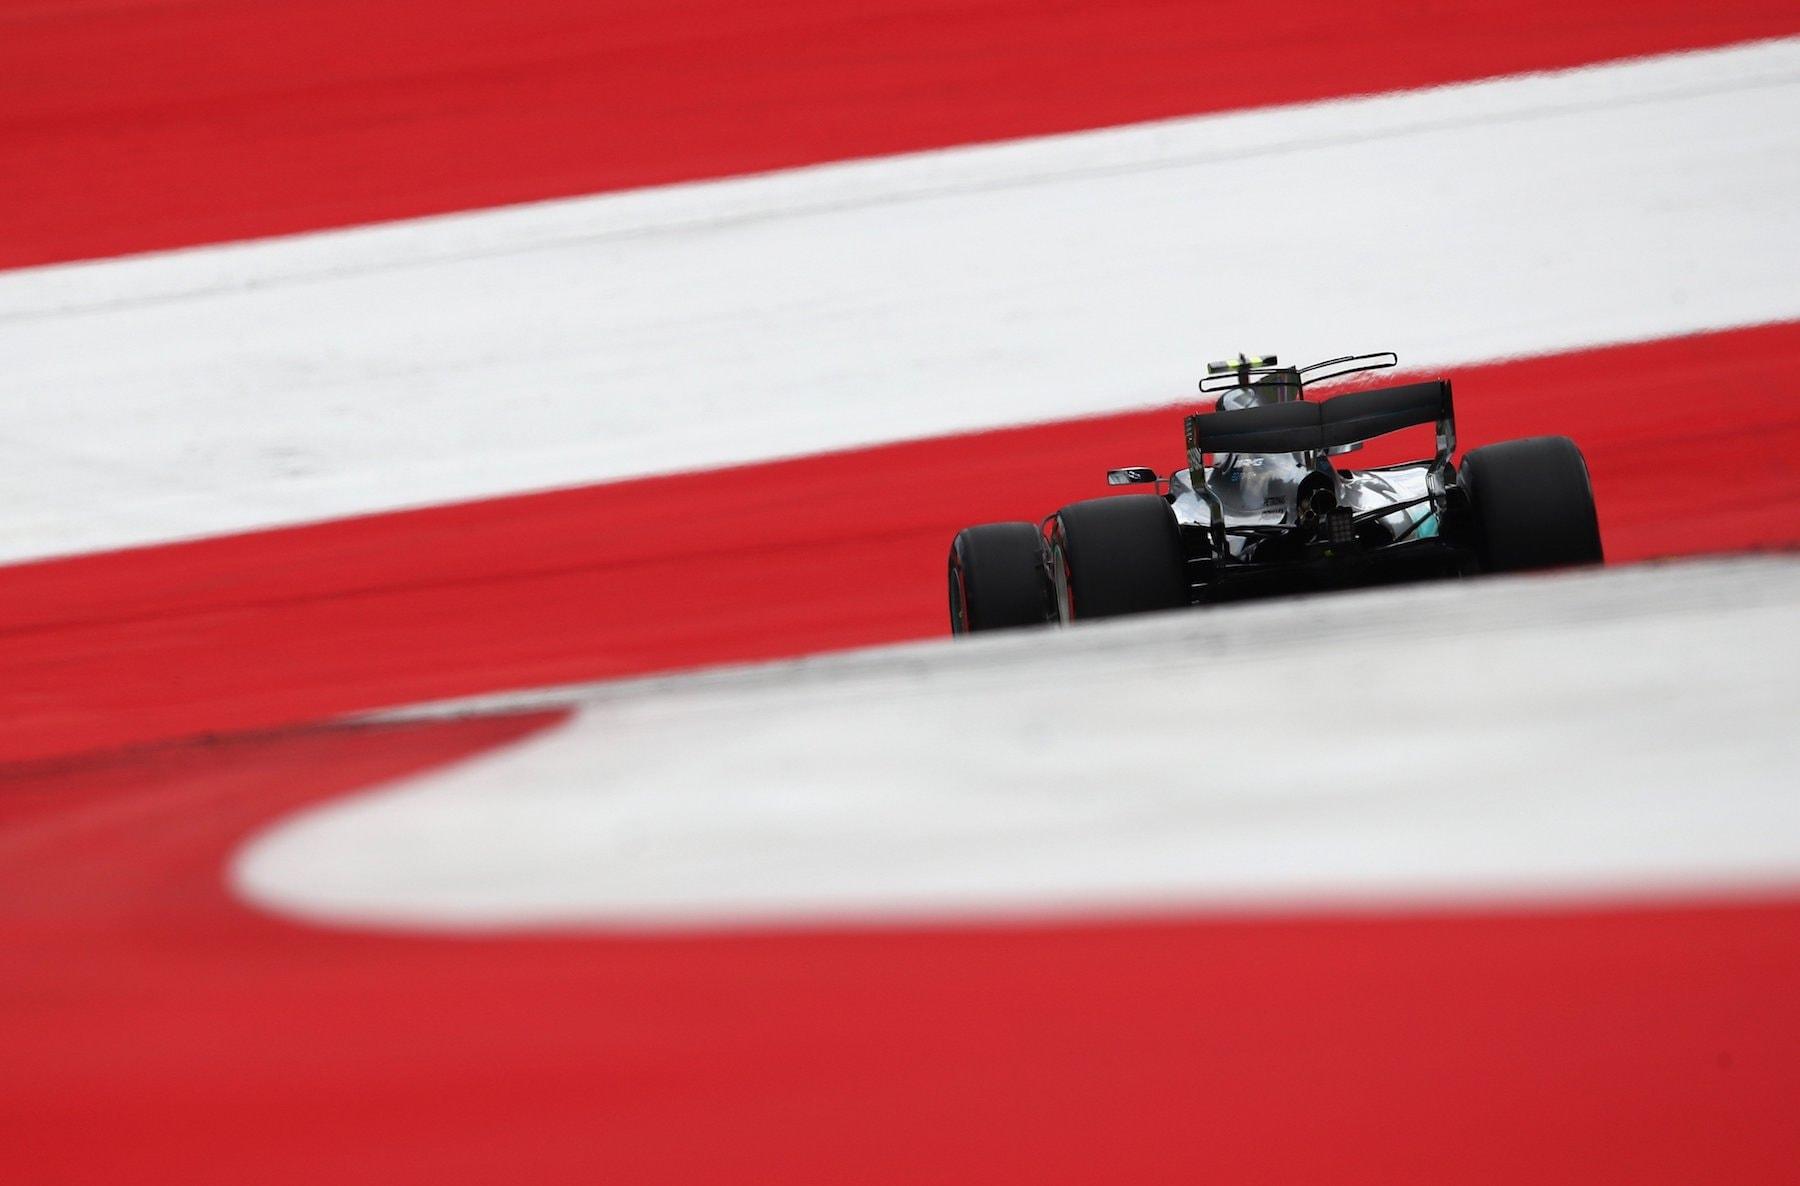 G 2017 Valtteri Bottas | Mercedes W08 | 2017 Austrian GP winner 1 copy.jpg